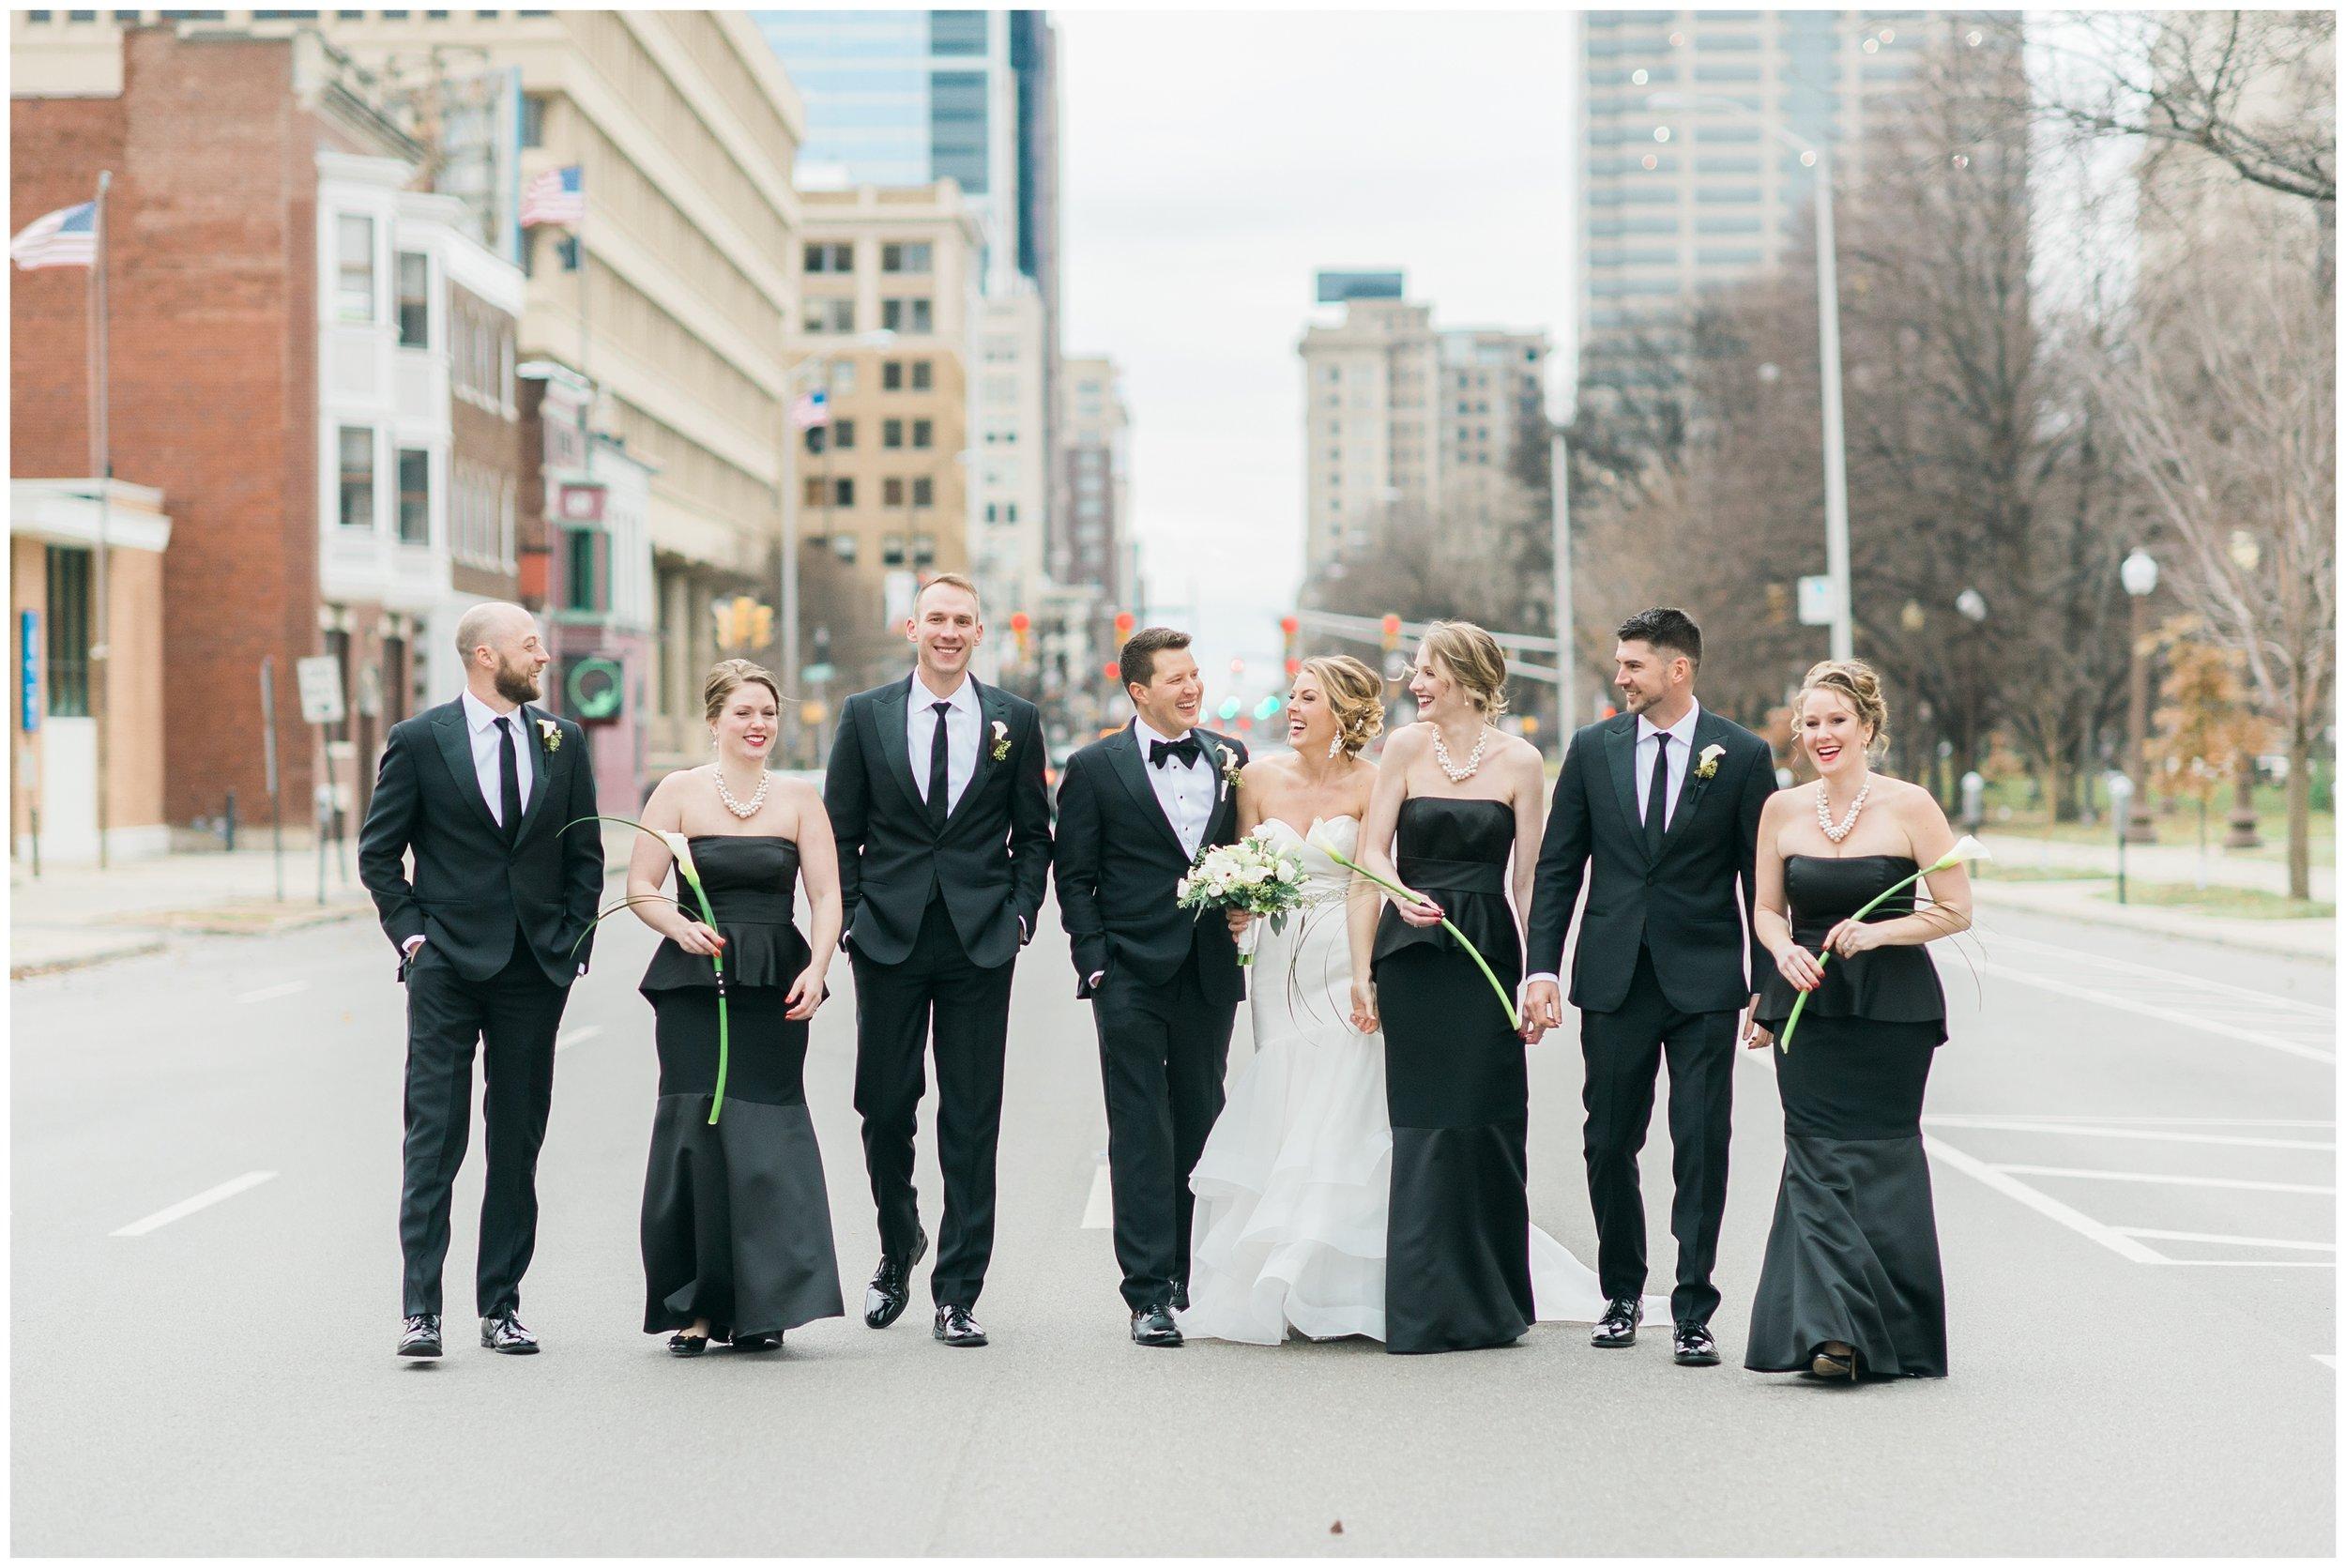 Rebecca_Bridges_Photography_Indianapolis_Wedding_Photographer_5821.jpg